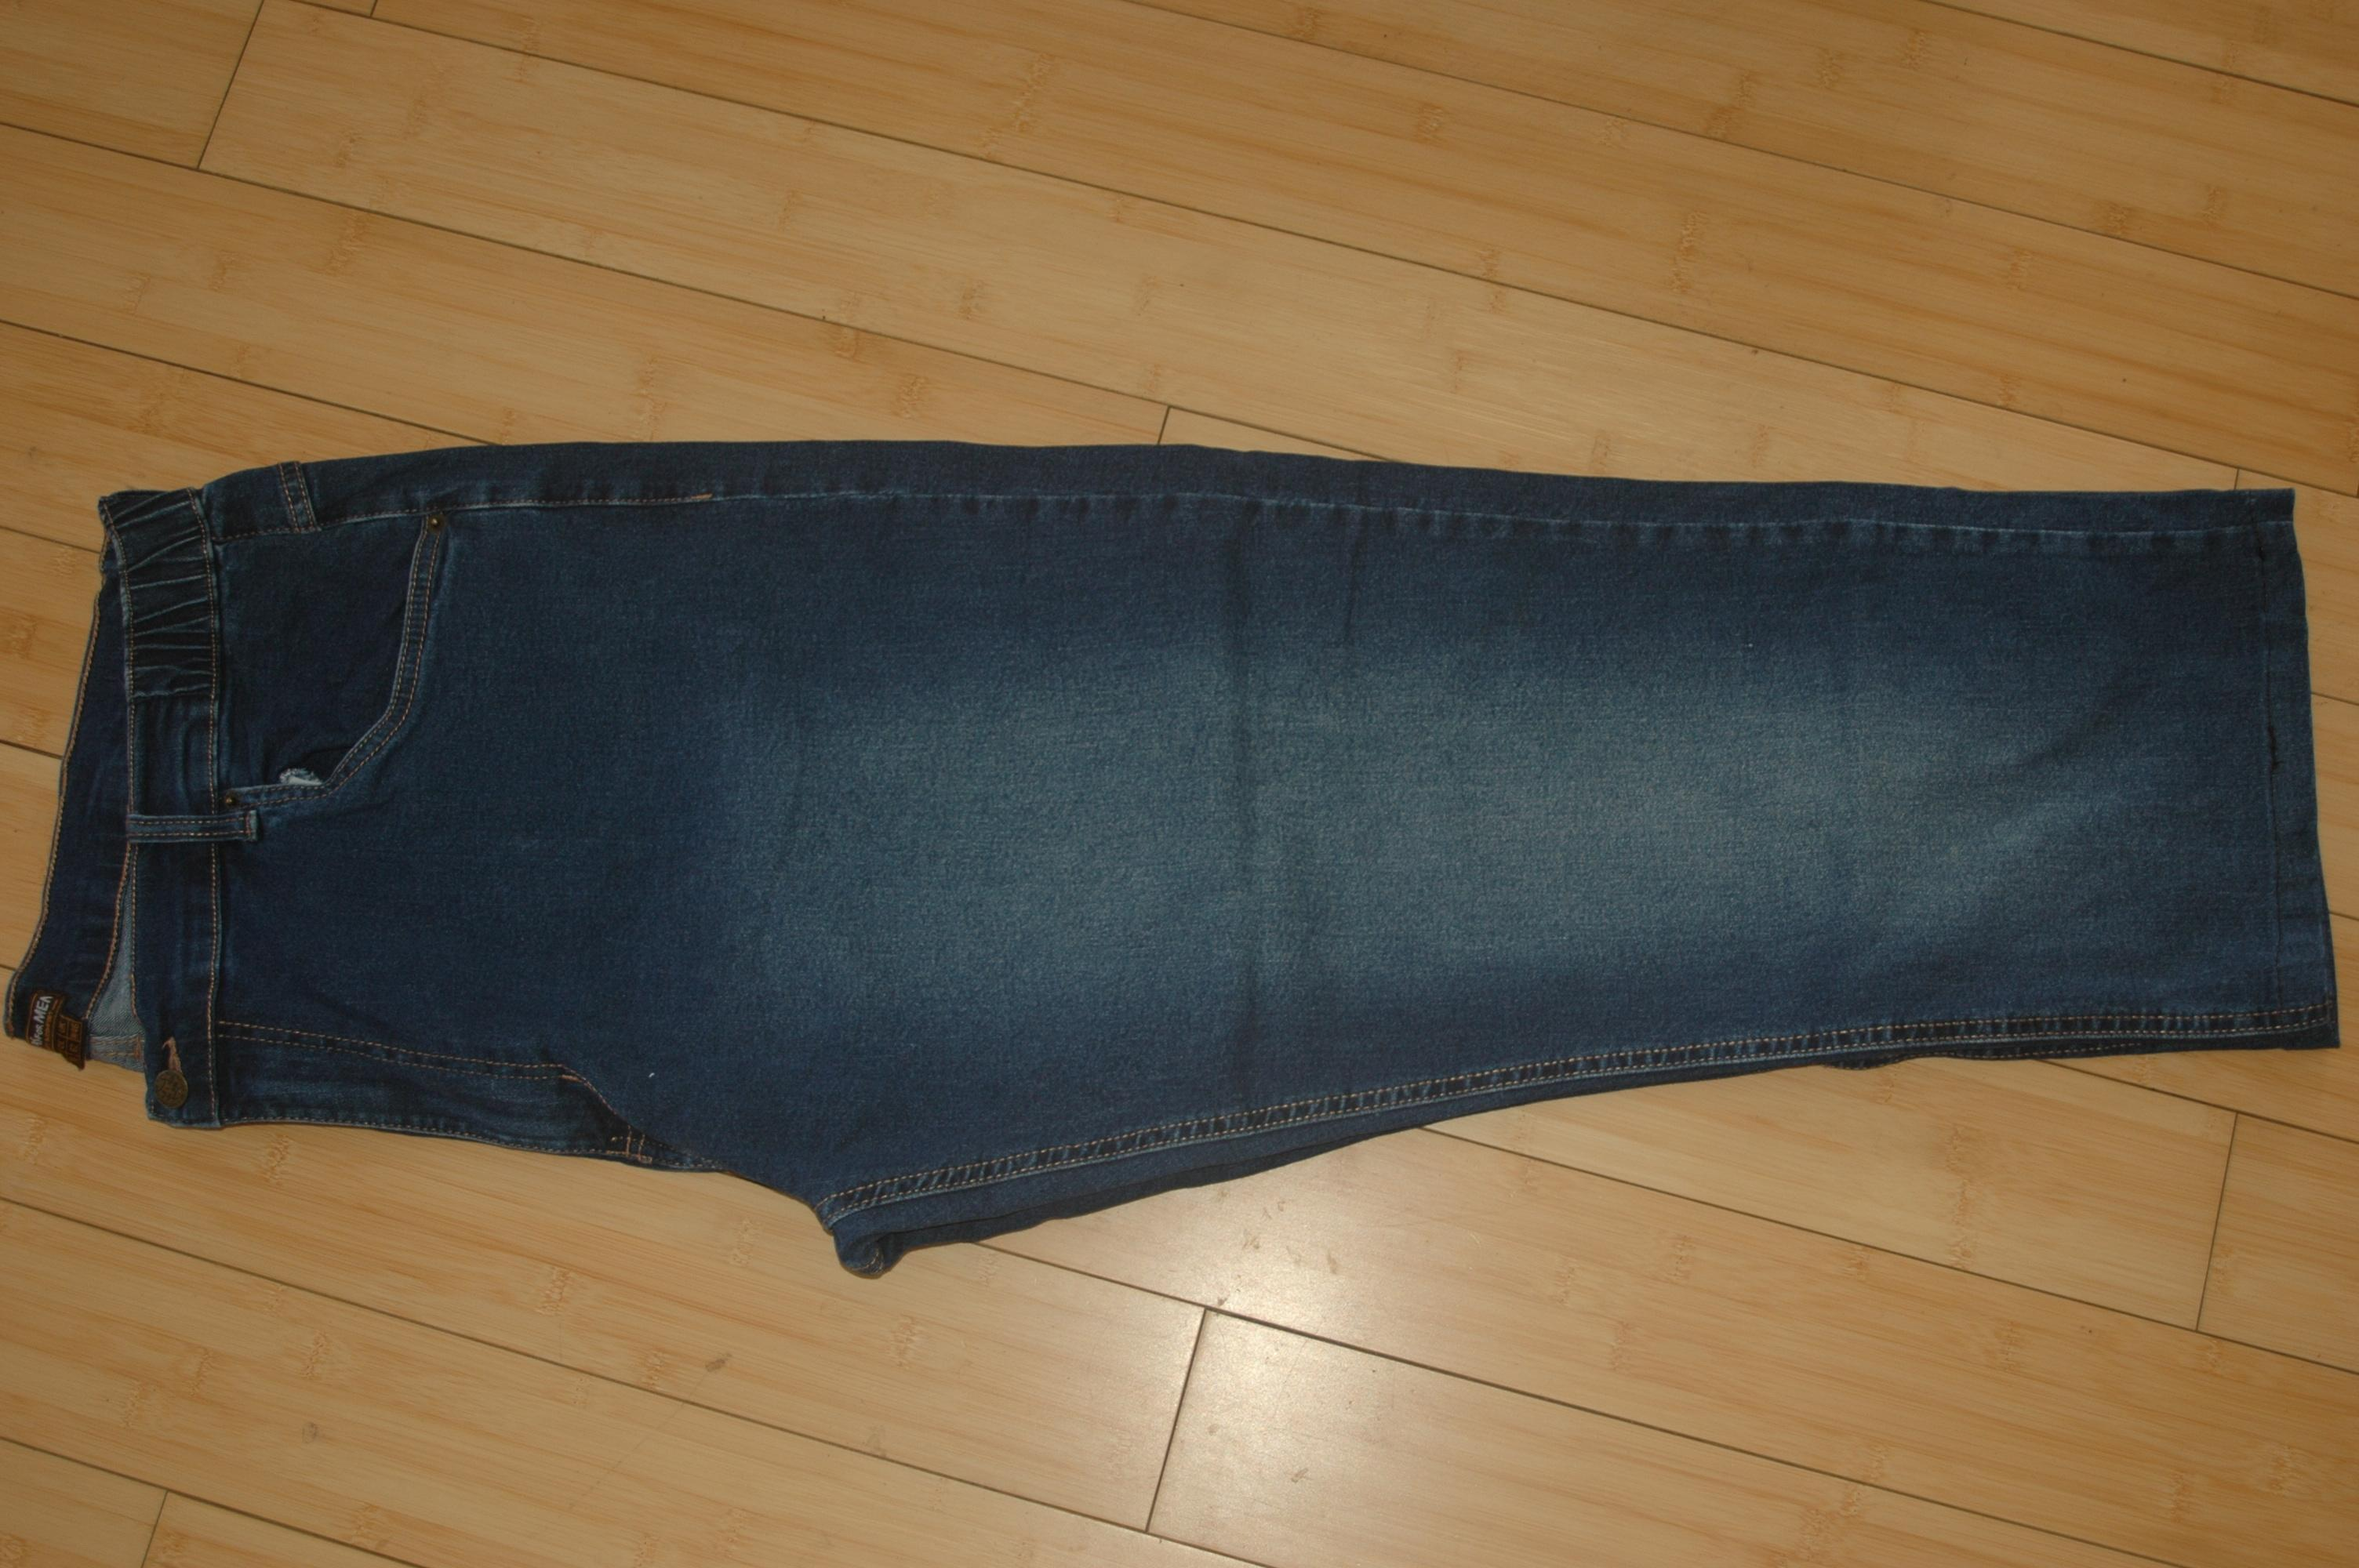 troc de troc jean homme taille 56 image 0